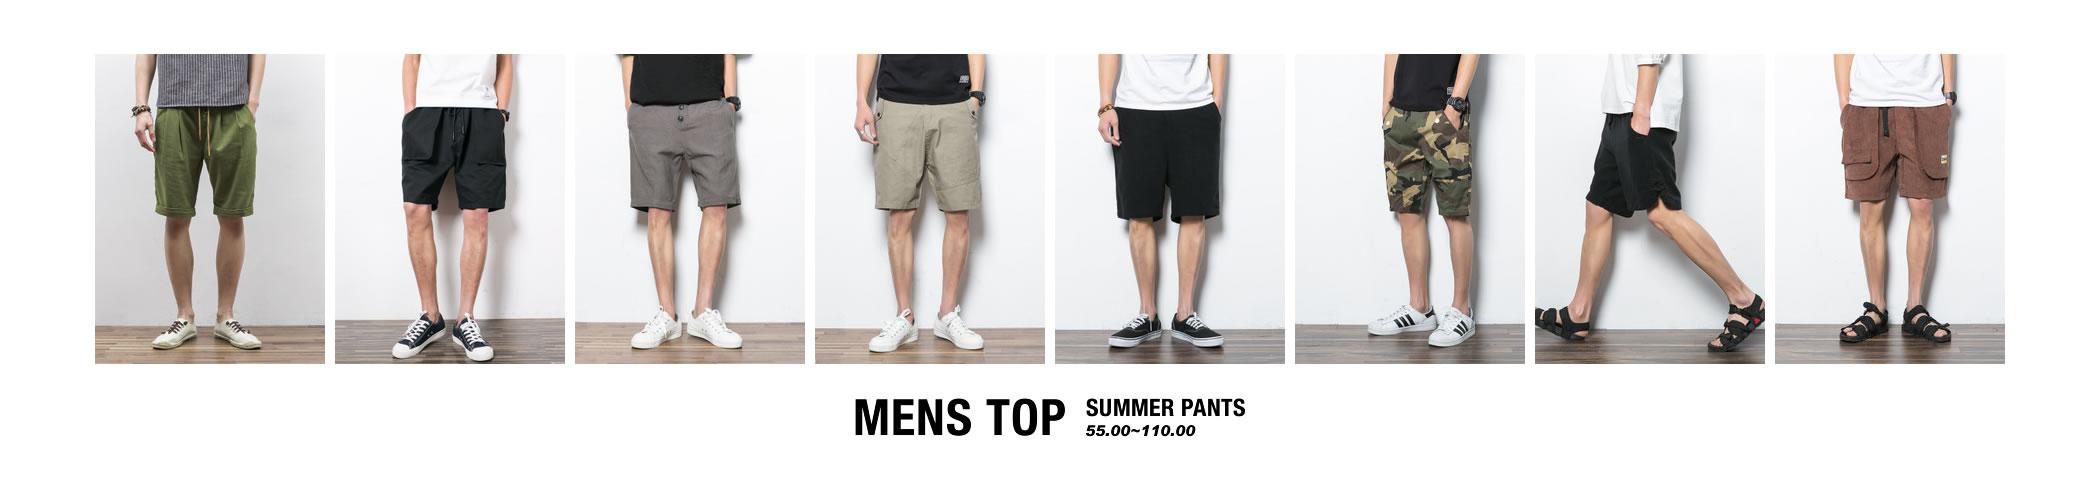 MENS TOP 2016SS SUMMER PANTS